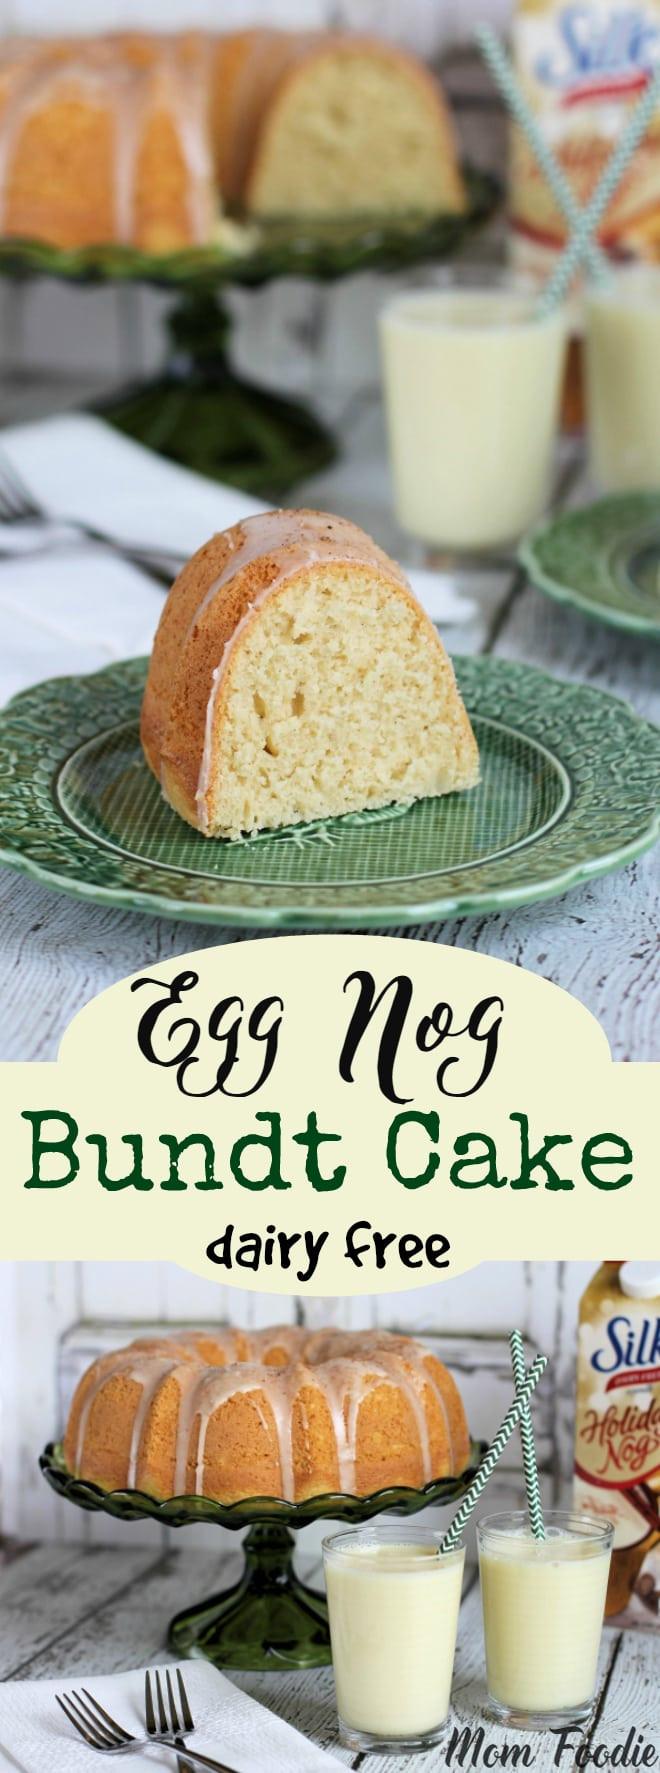 Desserts Without Dairy  Eggnog Bundt Cake Recipe